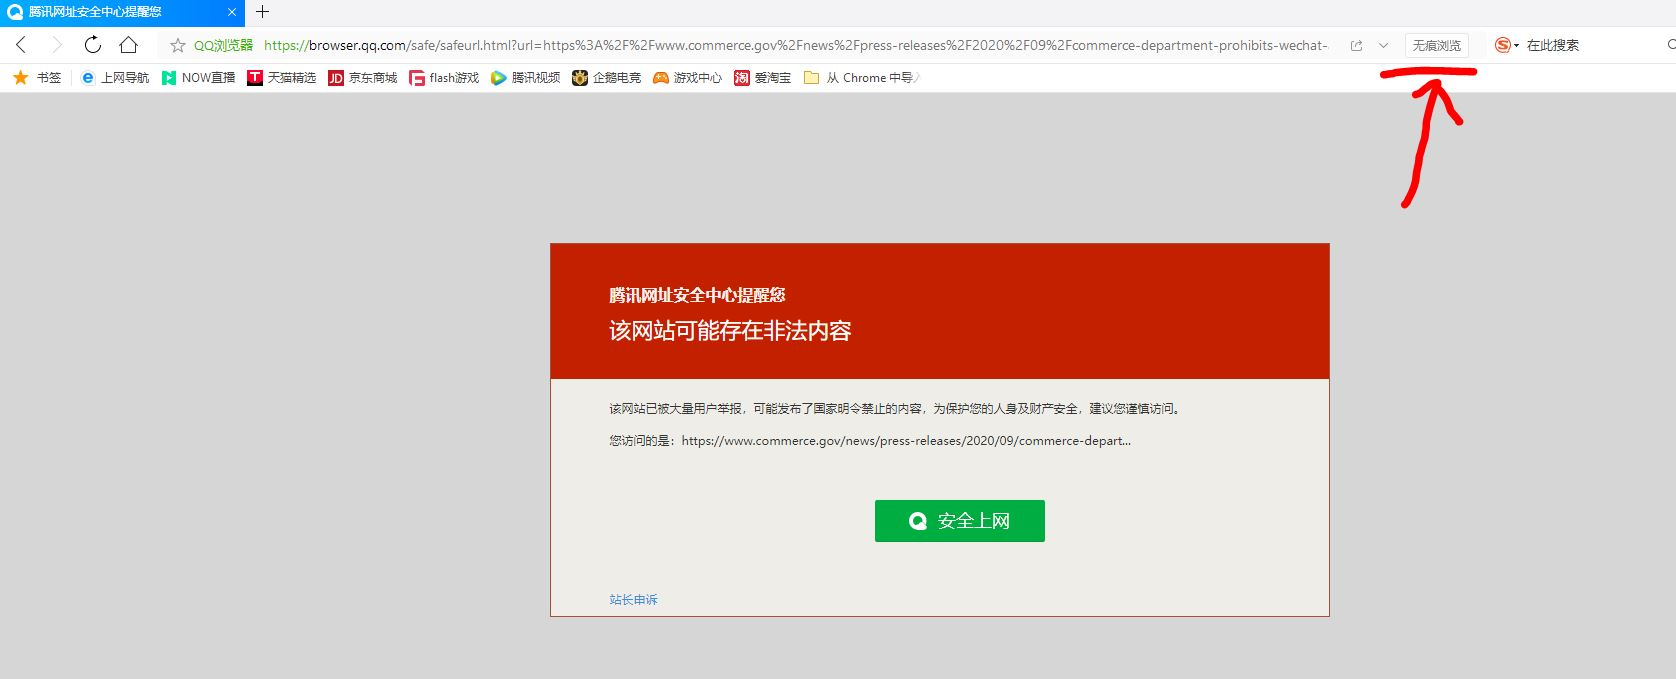 QQ浏览器无痕模式下测试截图